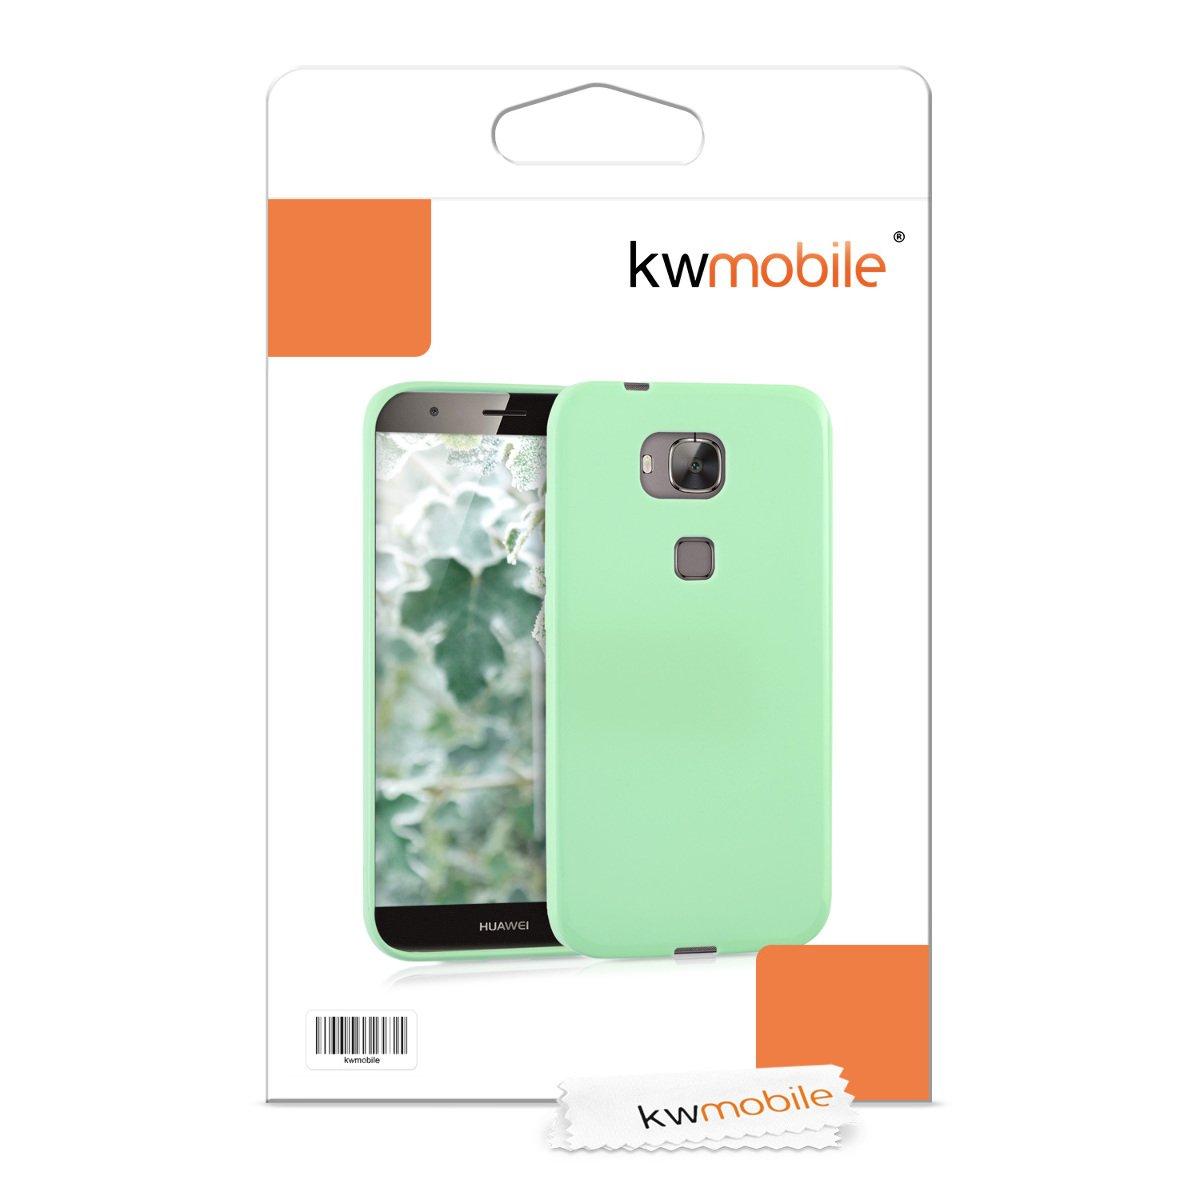 Amazon.com: kwmobile Funda TPU silicona chic para el Huawei ...